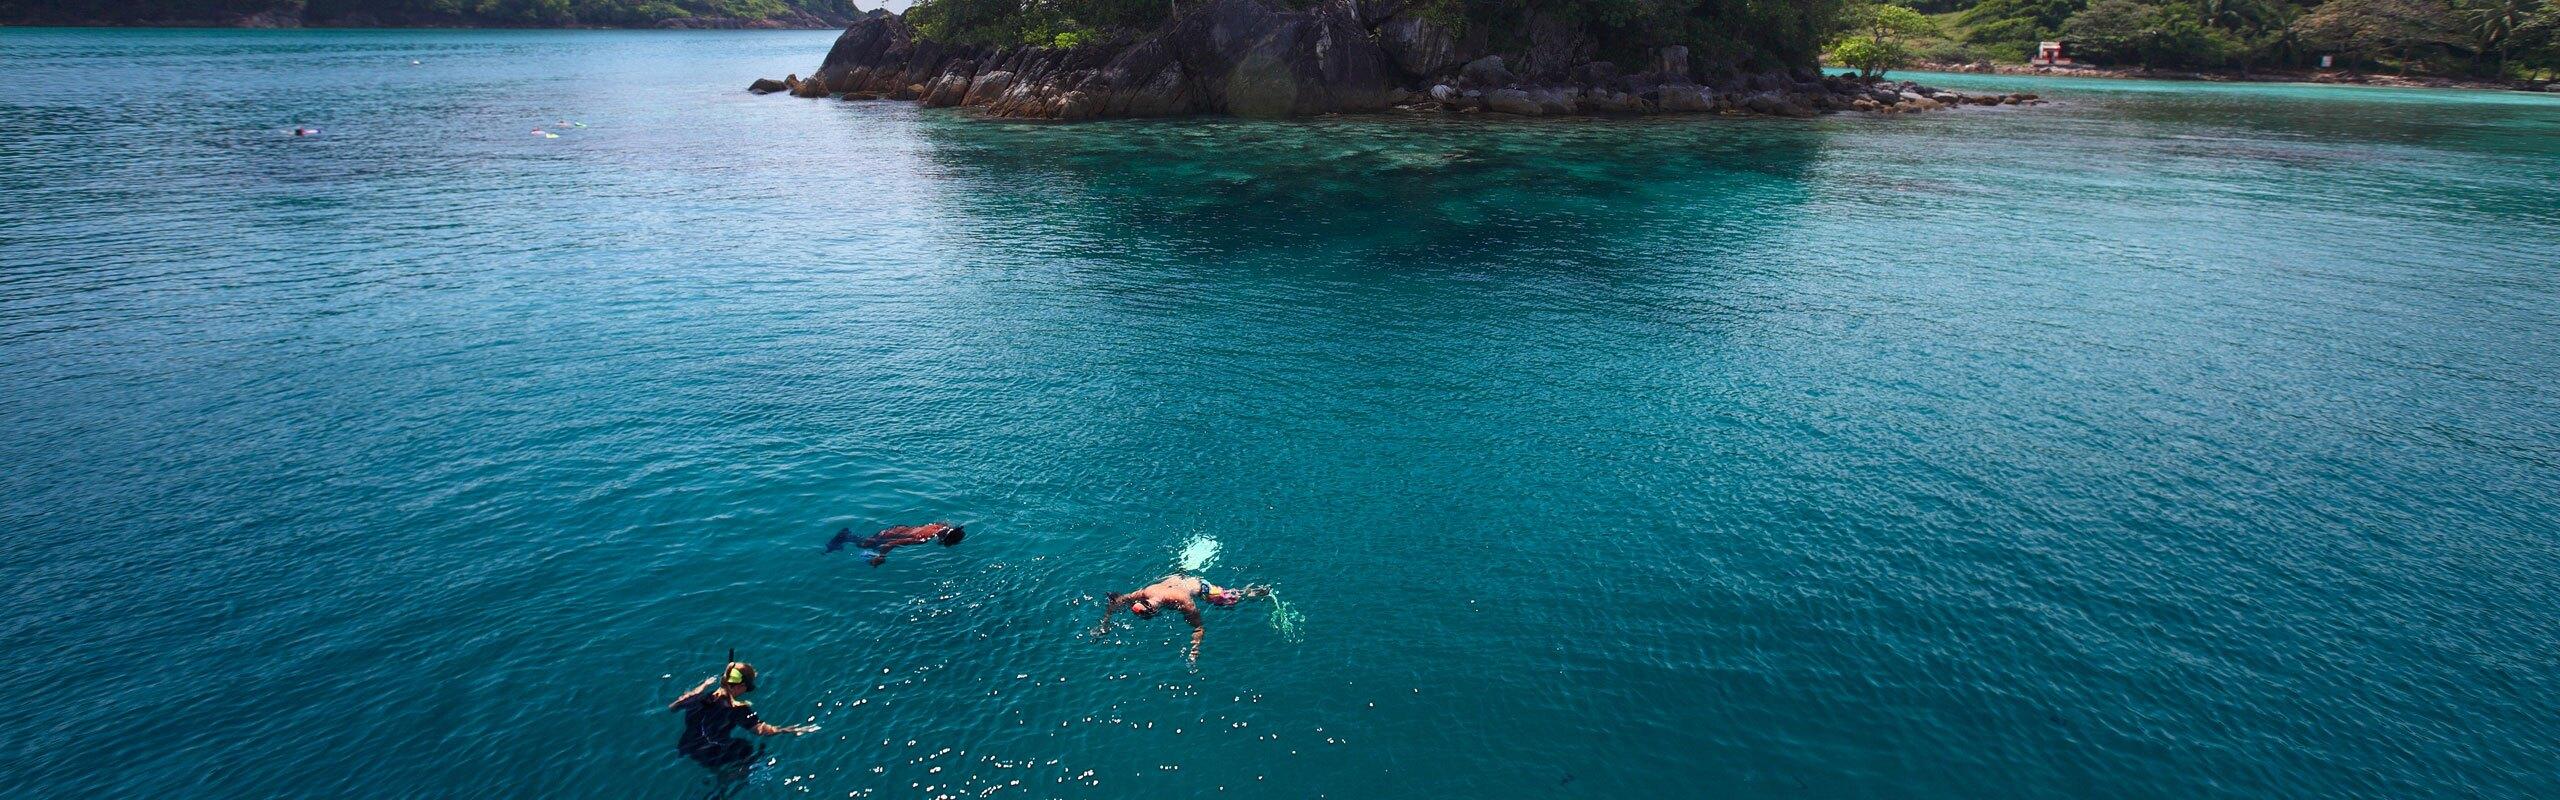 10-Day Island Hopping Tour around Eastern Thailand